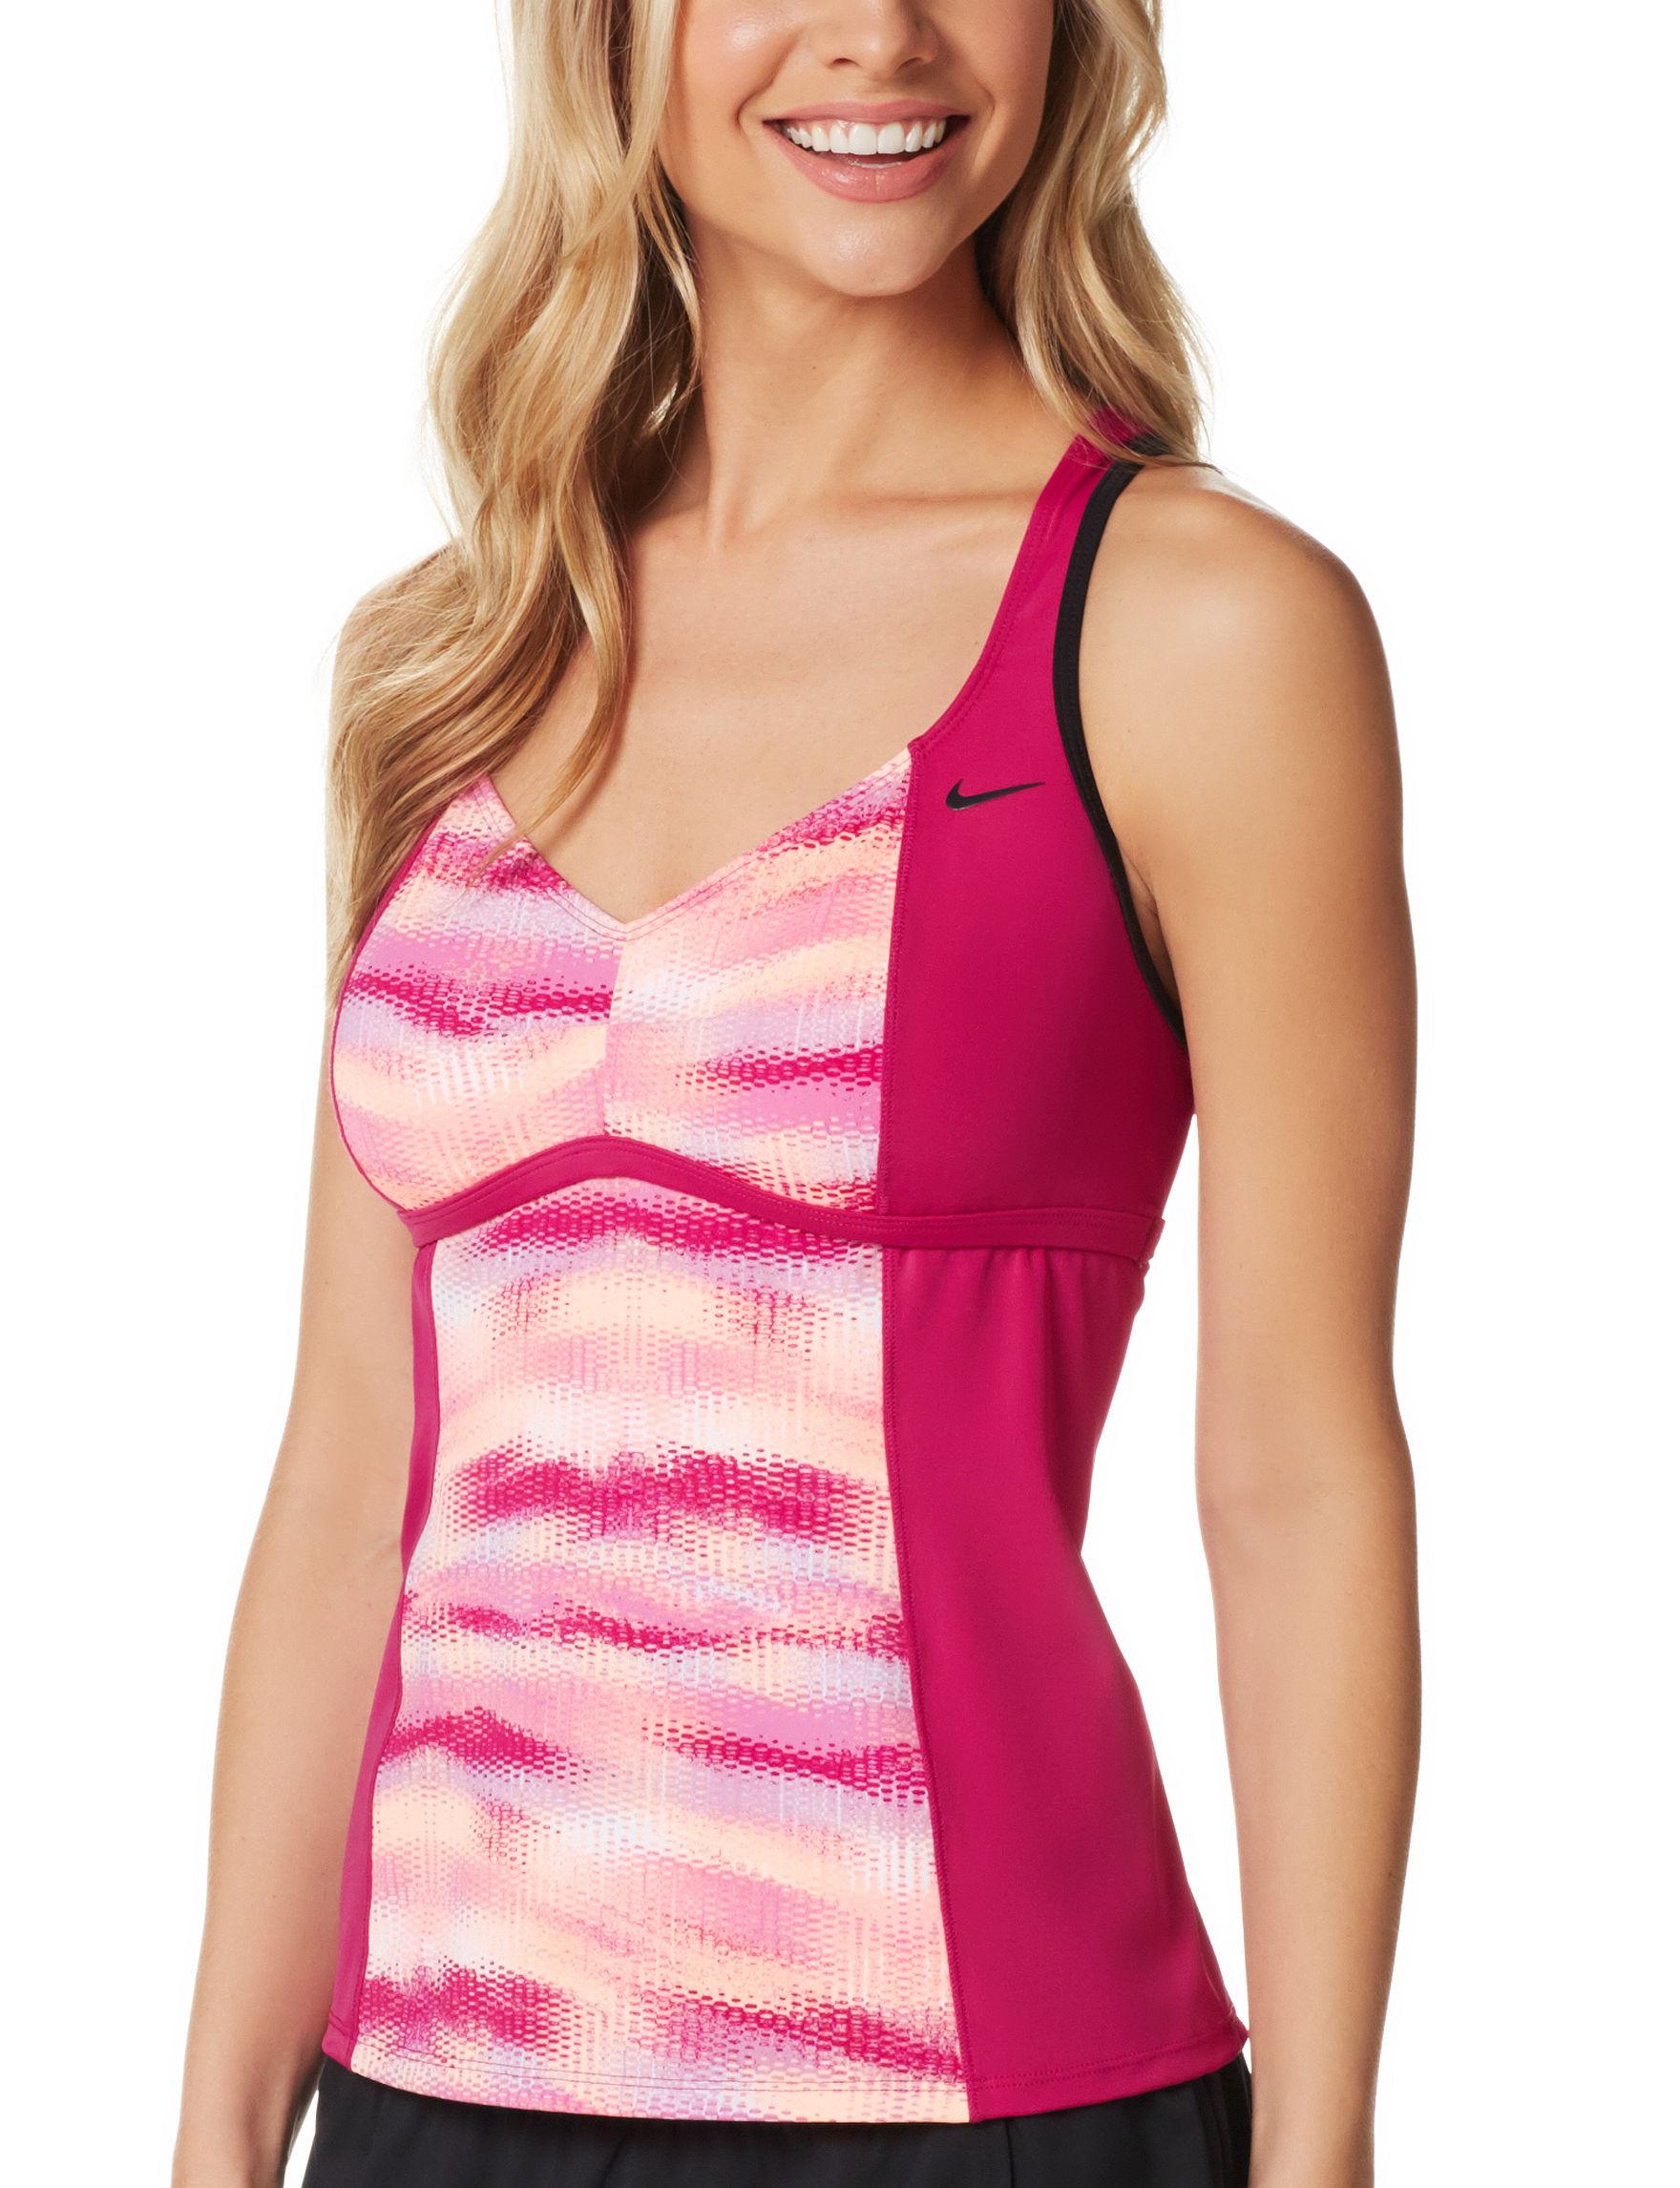 Nike Pink Swimsuit Tops Tankini